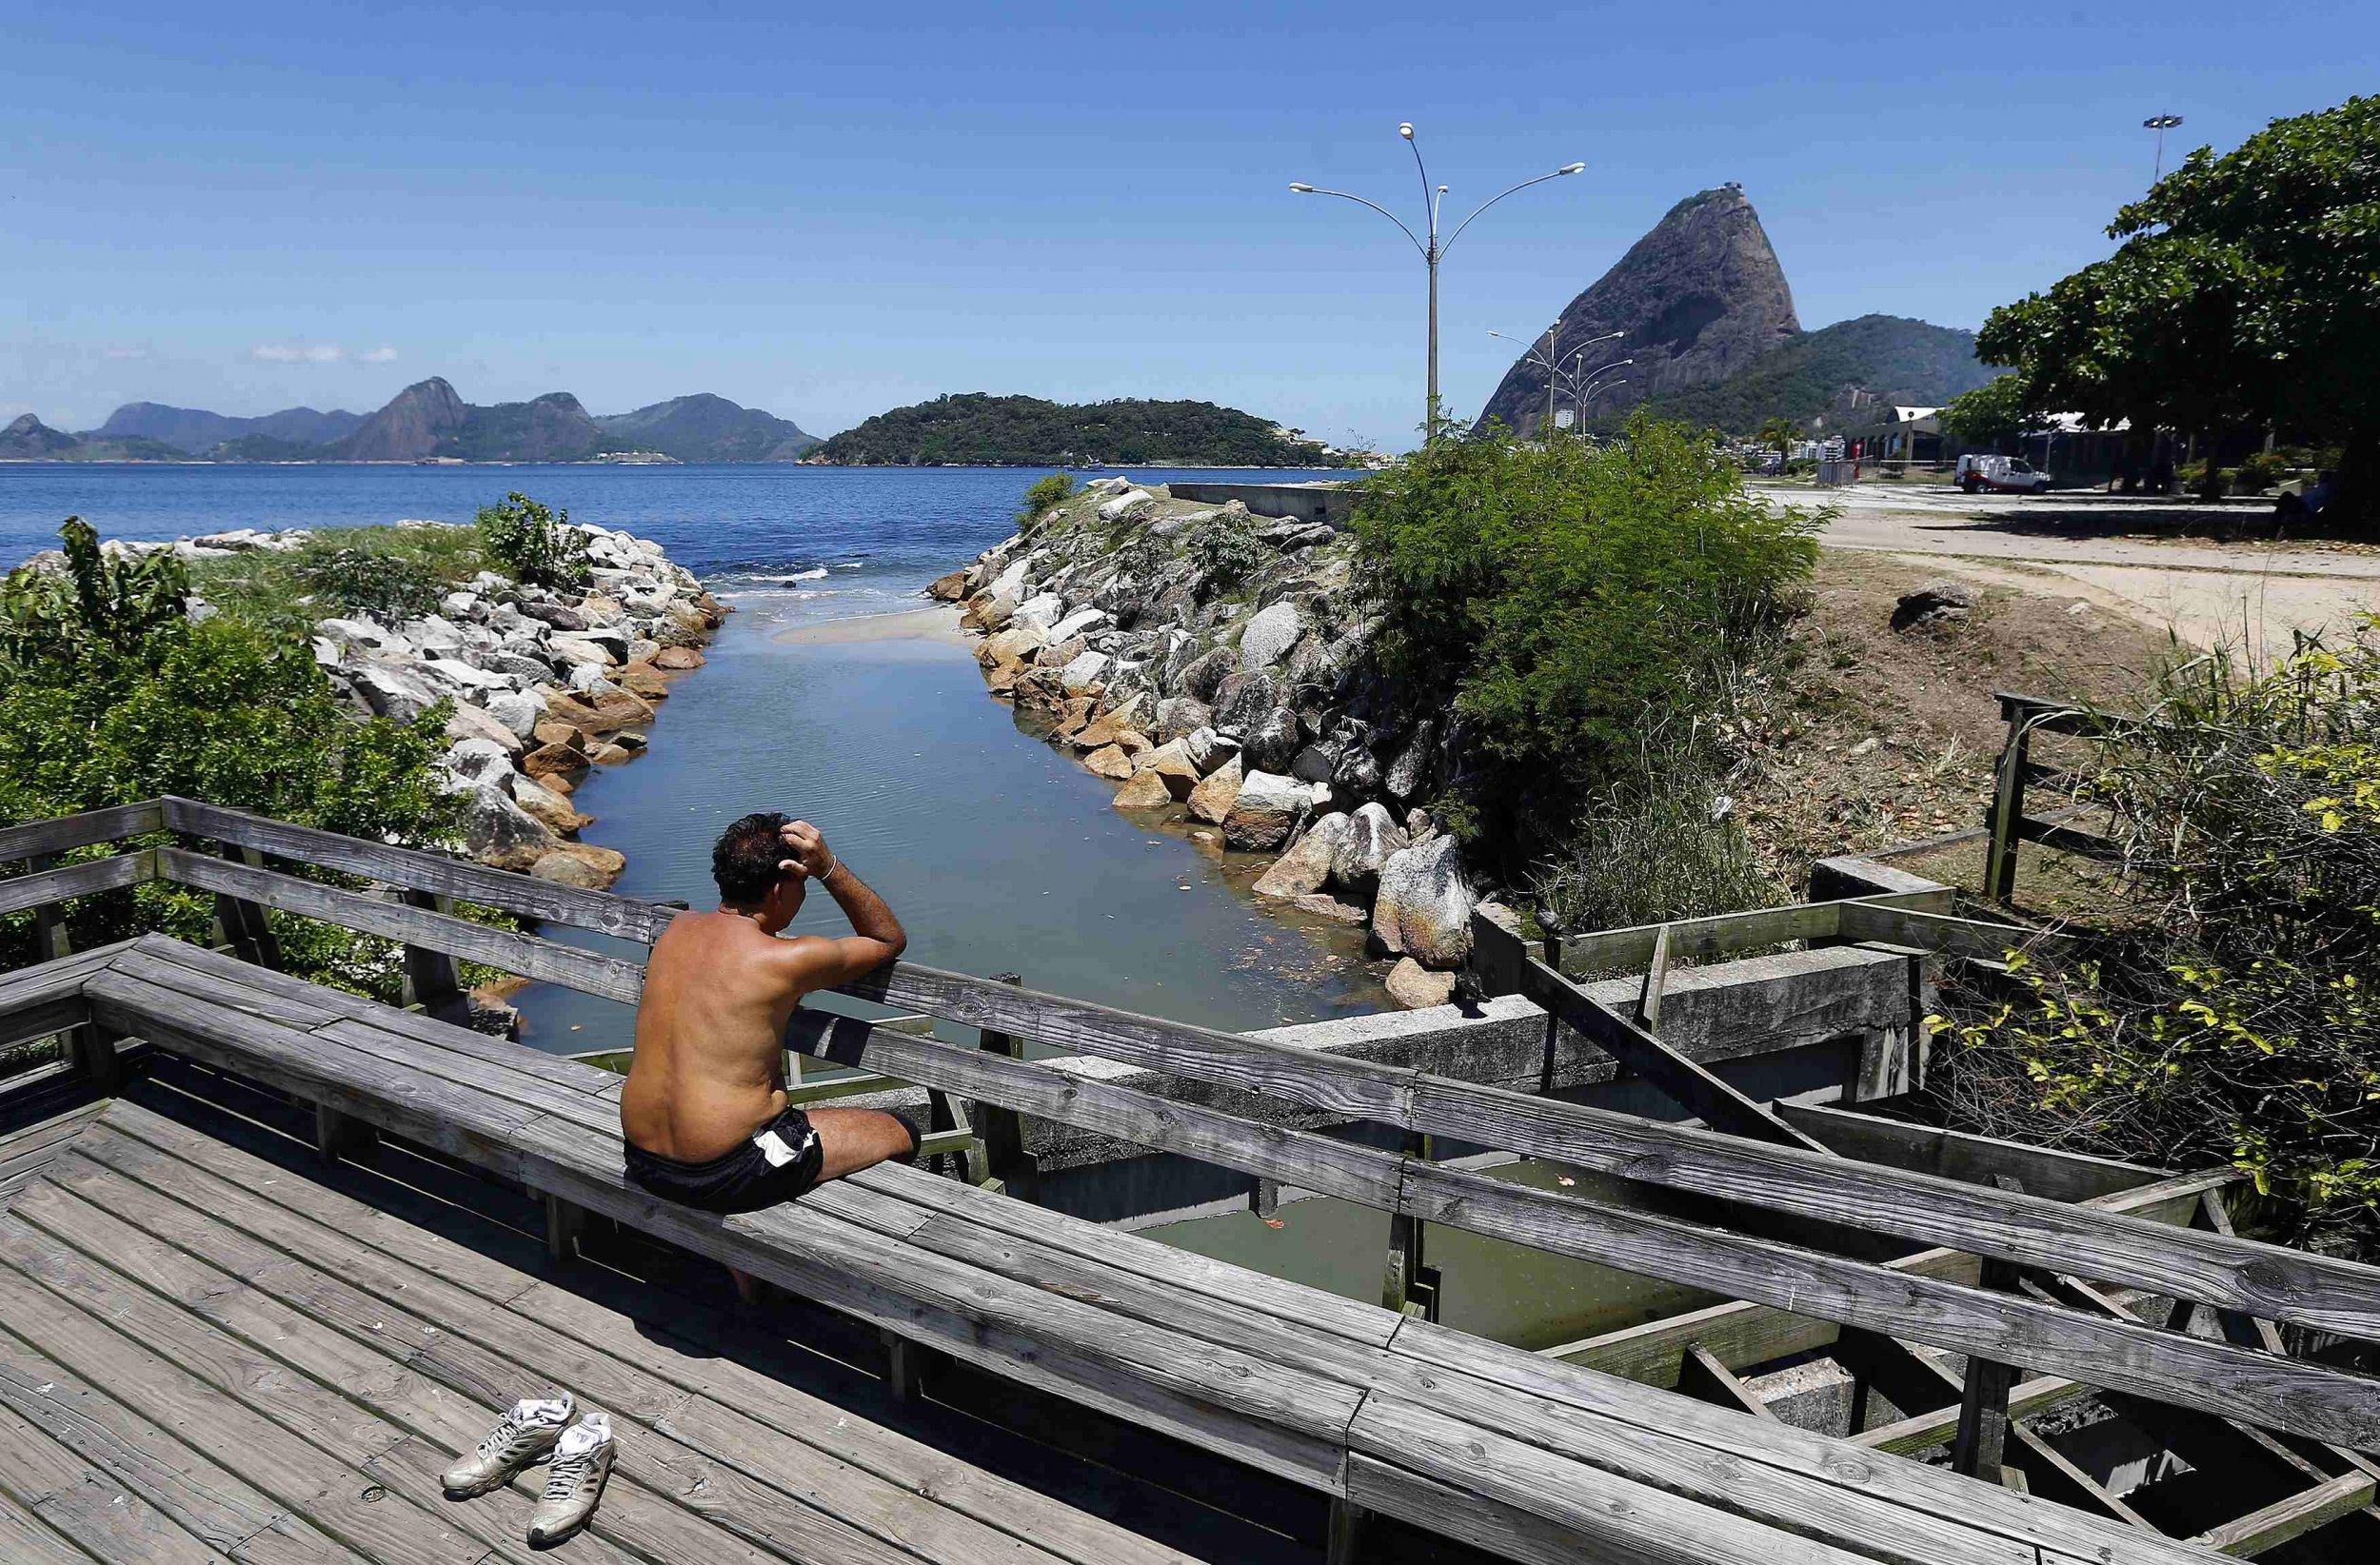 2014-12-16T172617Z_820516355_GM1EACH03U901_RTRMADP_3_OLYMPICS-BRAZIL-BACTERIA